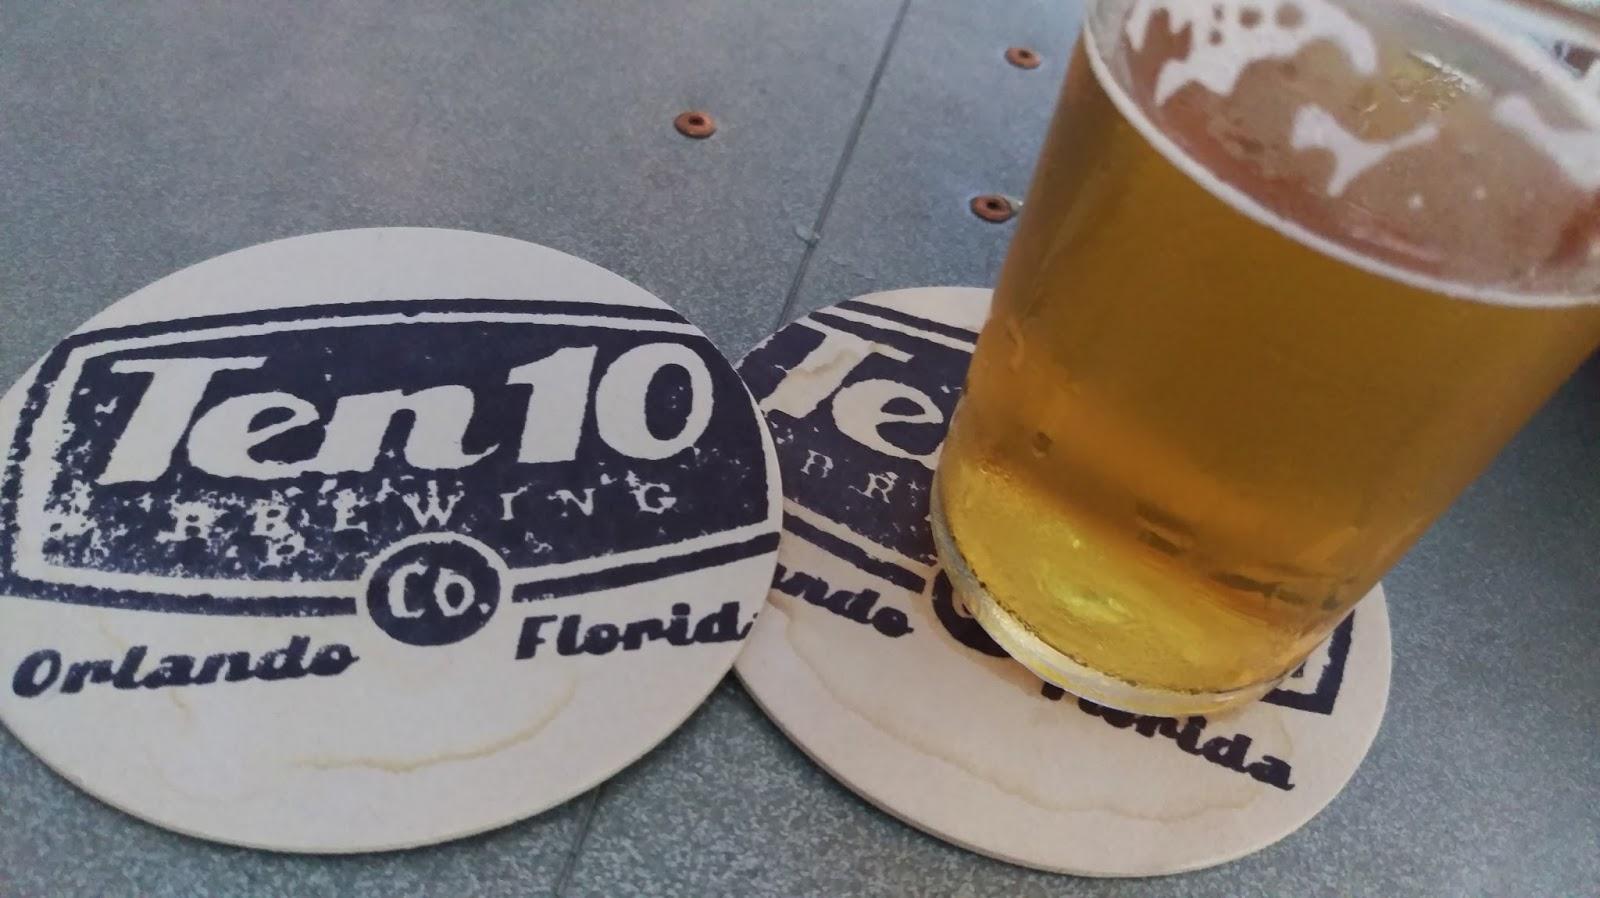 BrewNymph®: You Know Where to Find 'Em: Ten 10 Brewing, Orlando